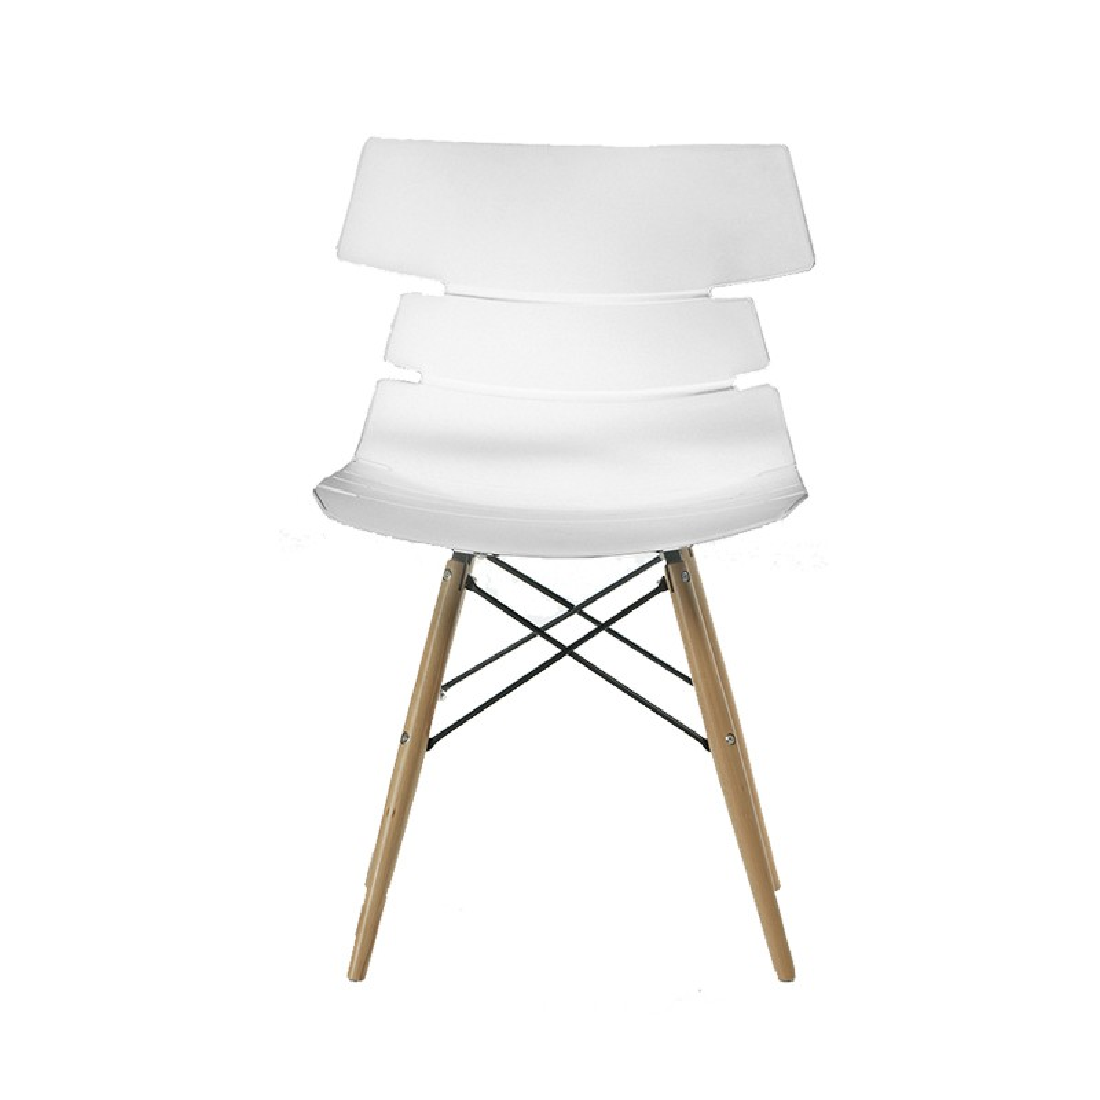 quatuor de chaises blanches siry univers salle manger. Black Bedroom Furniture Sets. Home Design Ideas